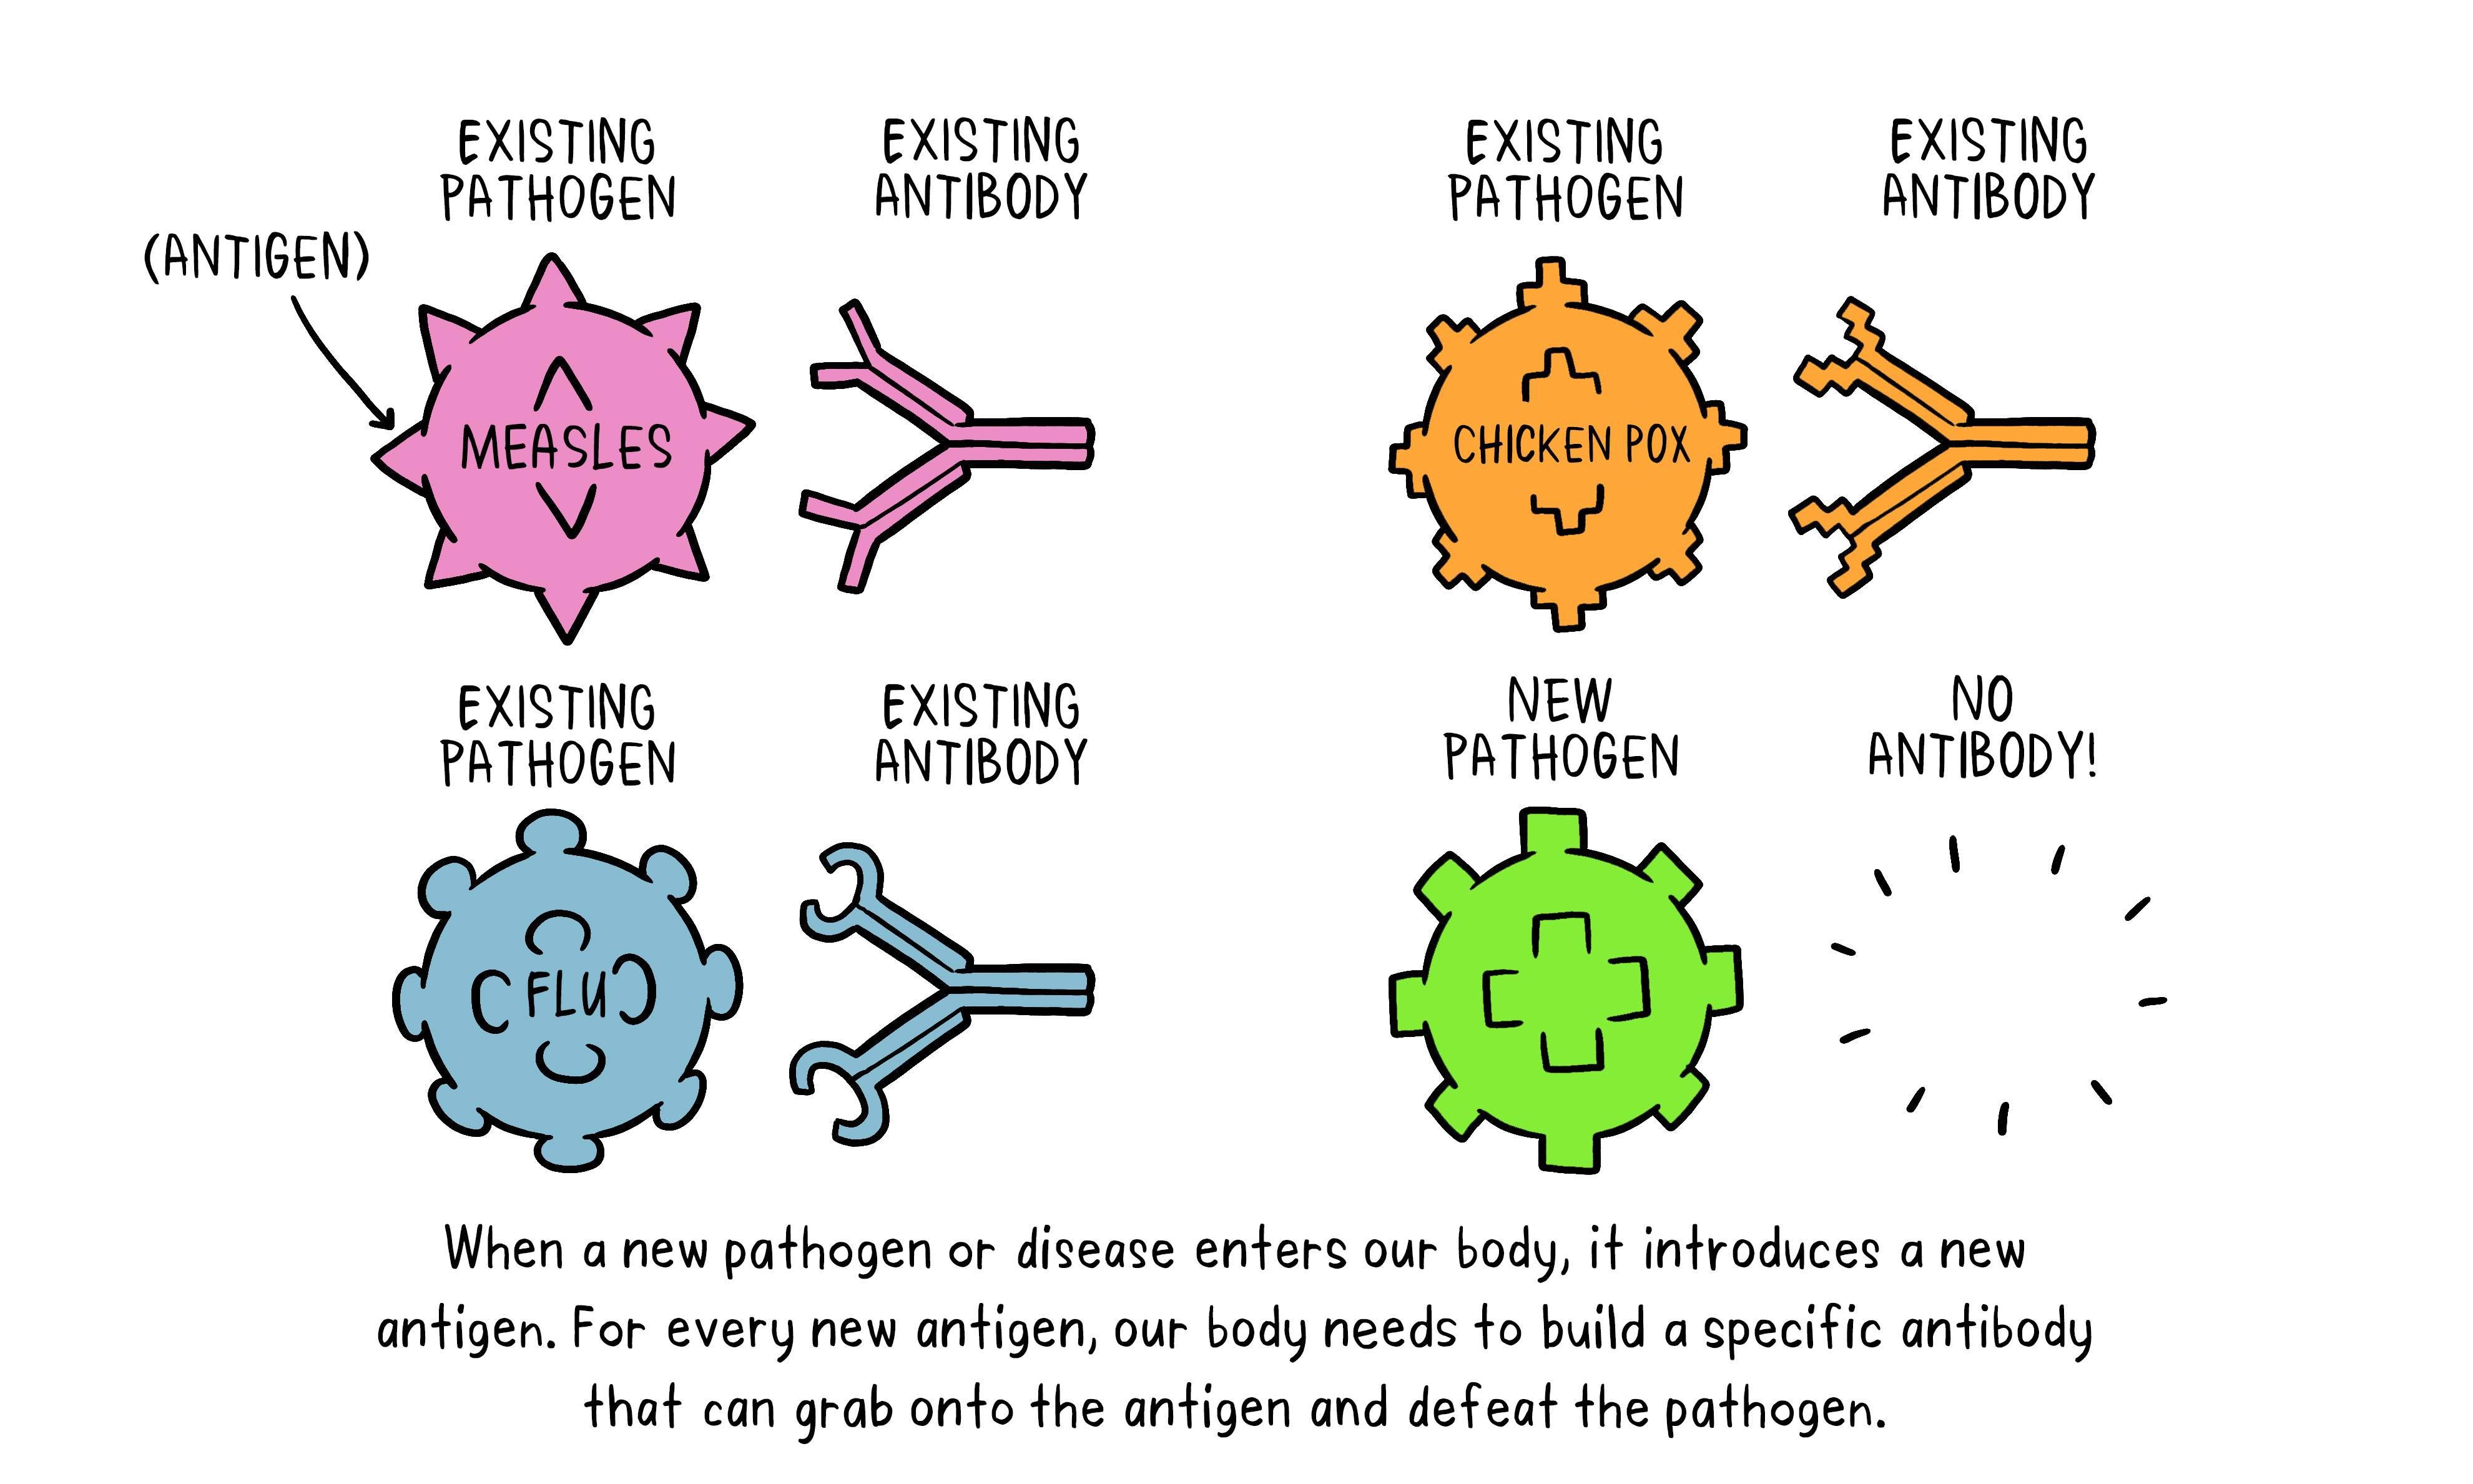 vaccines-antibody-illustration-01-29-oct7f4a97bd839b4b6996c82c1832a52682